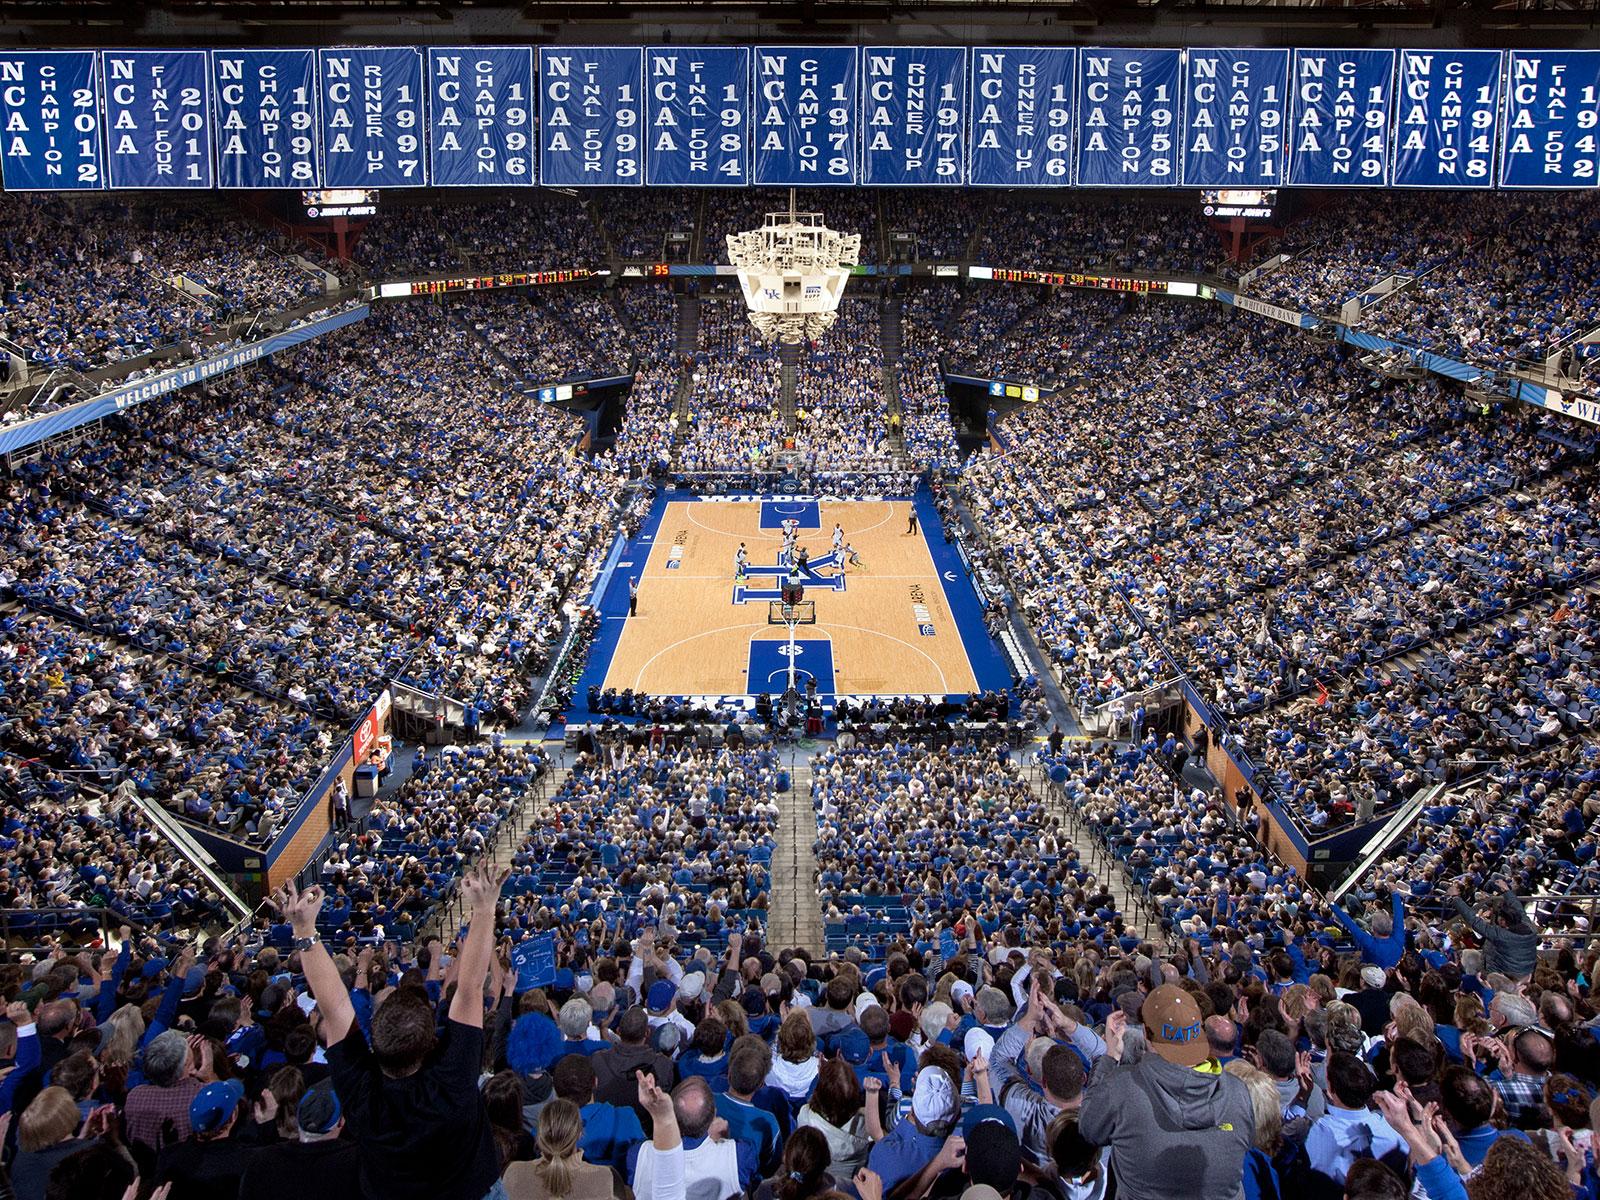 Kentucky Basketball Wallpaper For Desktop Wallpapersafari